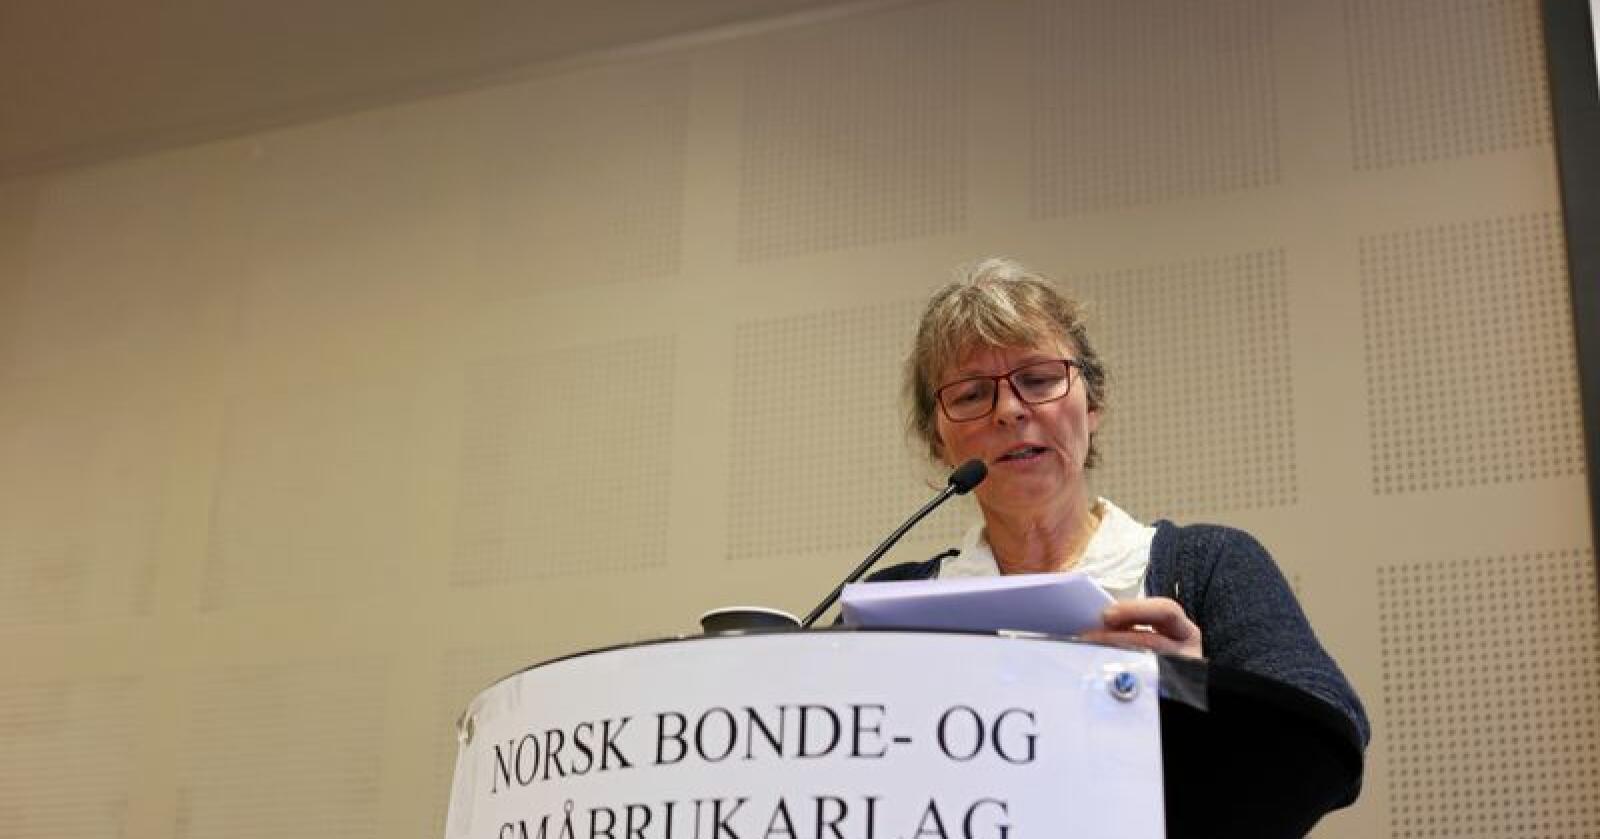 Klar: Kjersti Hoff venter debatt om Småbrukarlagets signatur på jordbrukspolitikken. Foto: Michael Brøndbo